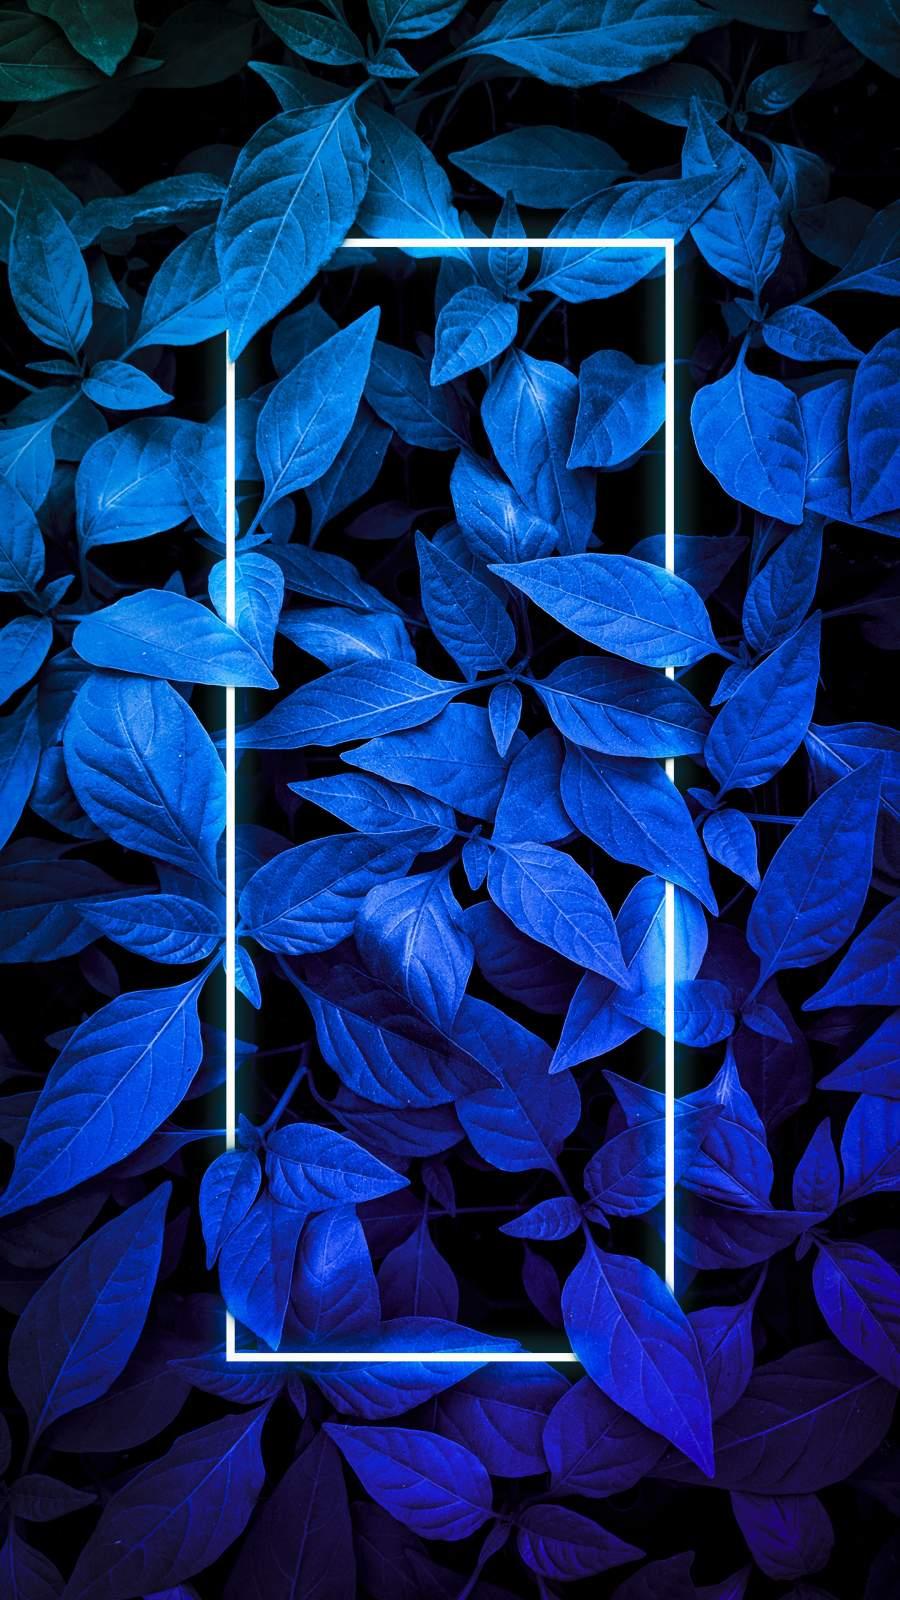 Blue Foliage Neon Light iPhone Wallpaper